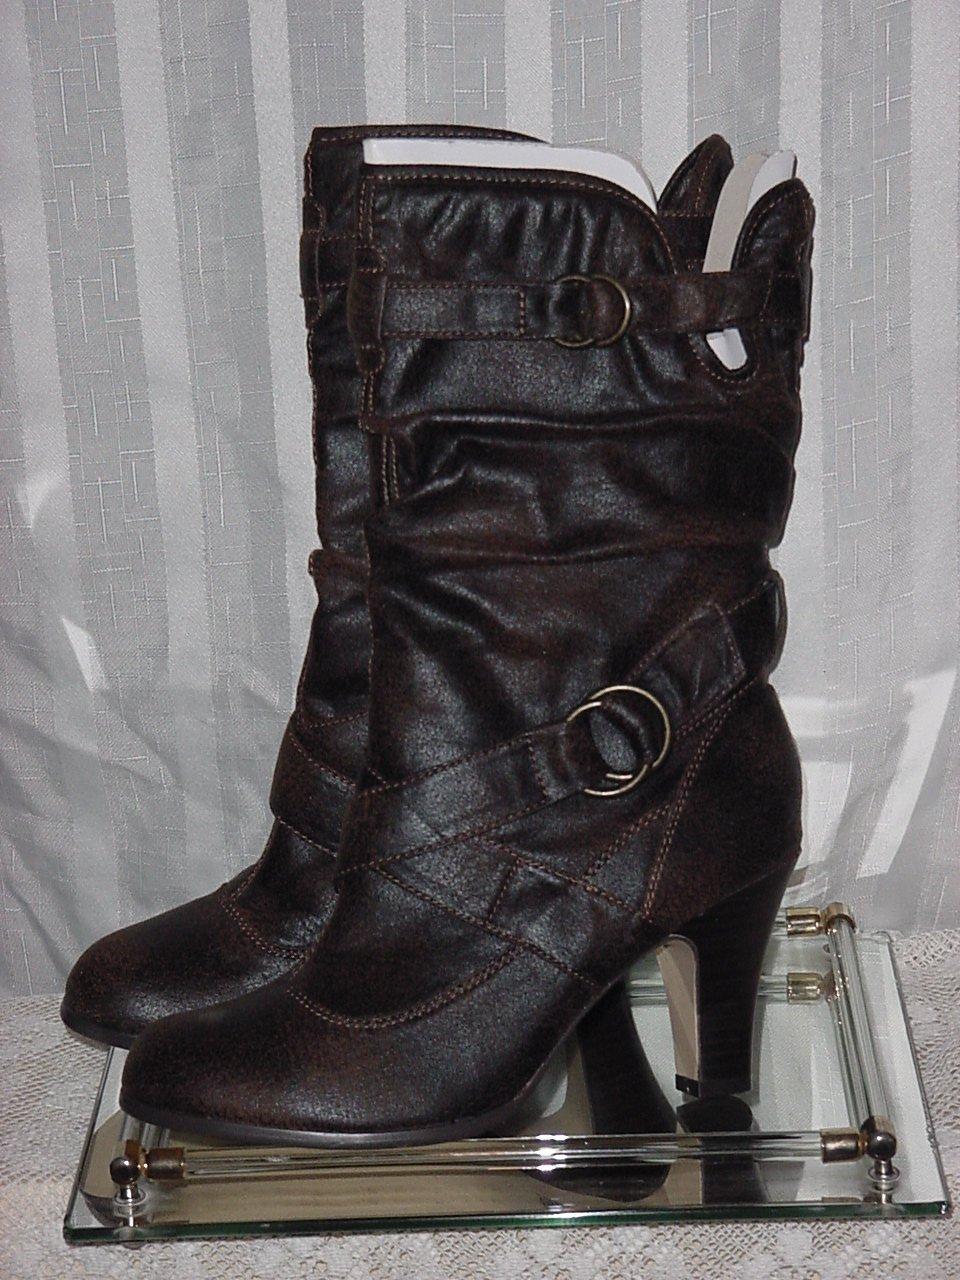 Womens Boots Ponder Calf High Fashion Boots 7M  No. 189